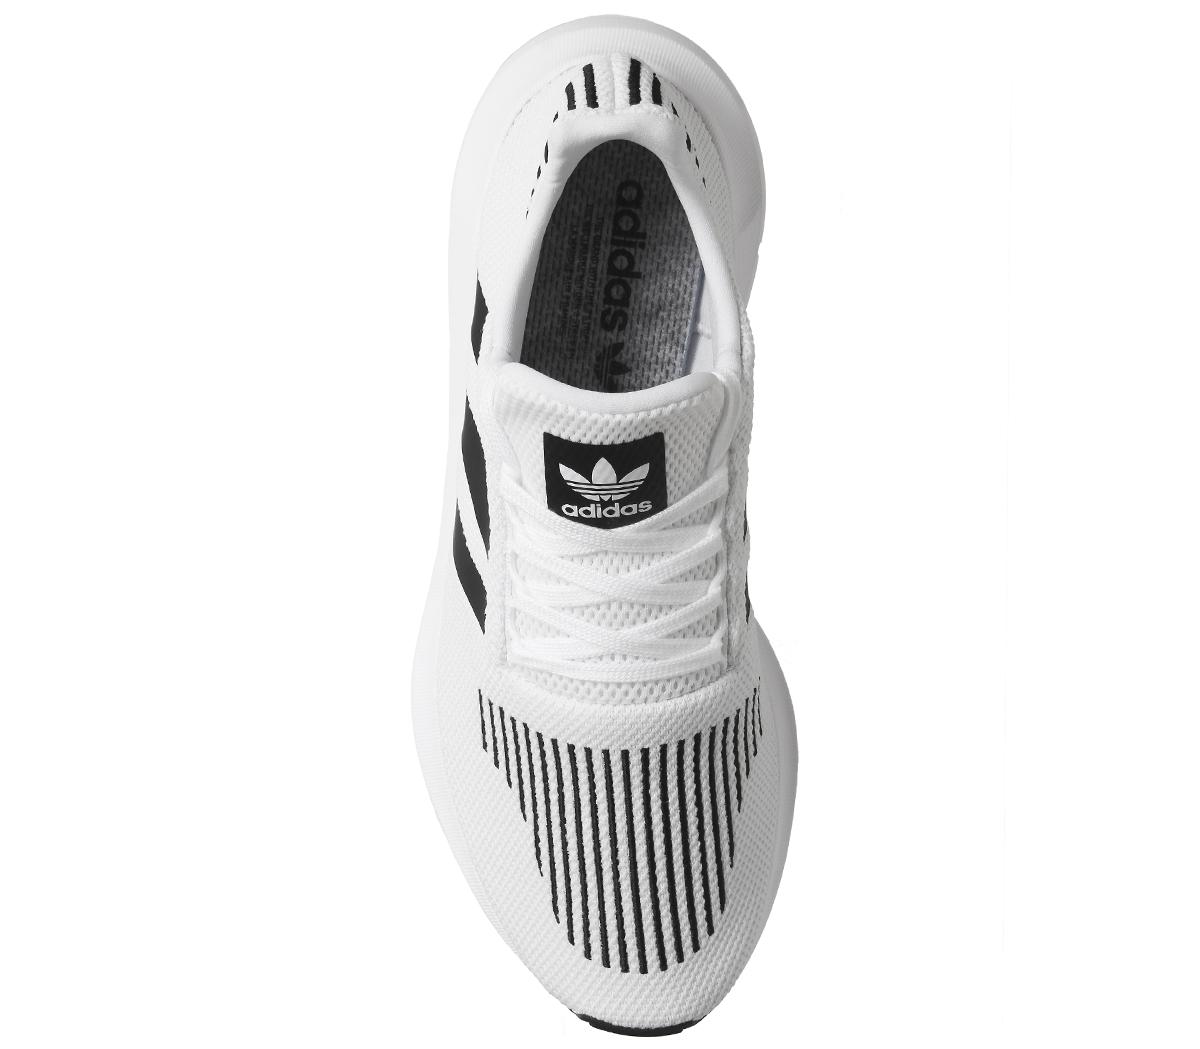 8eecf62933ed7 Adidas Swift Tenis Blanco Core Negro Gris Correr Tenis Zapatos